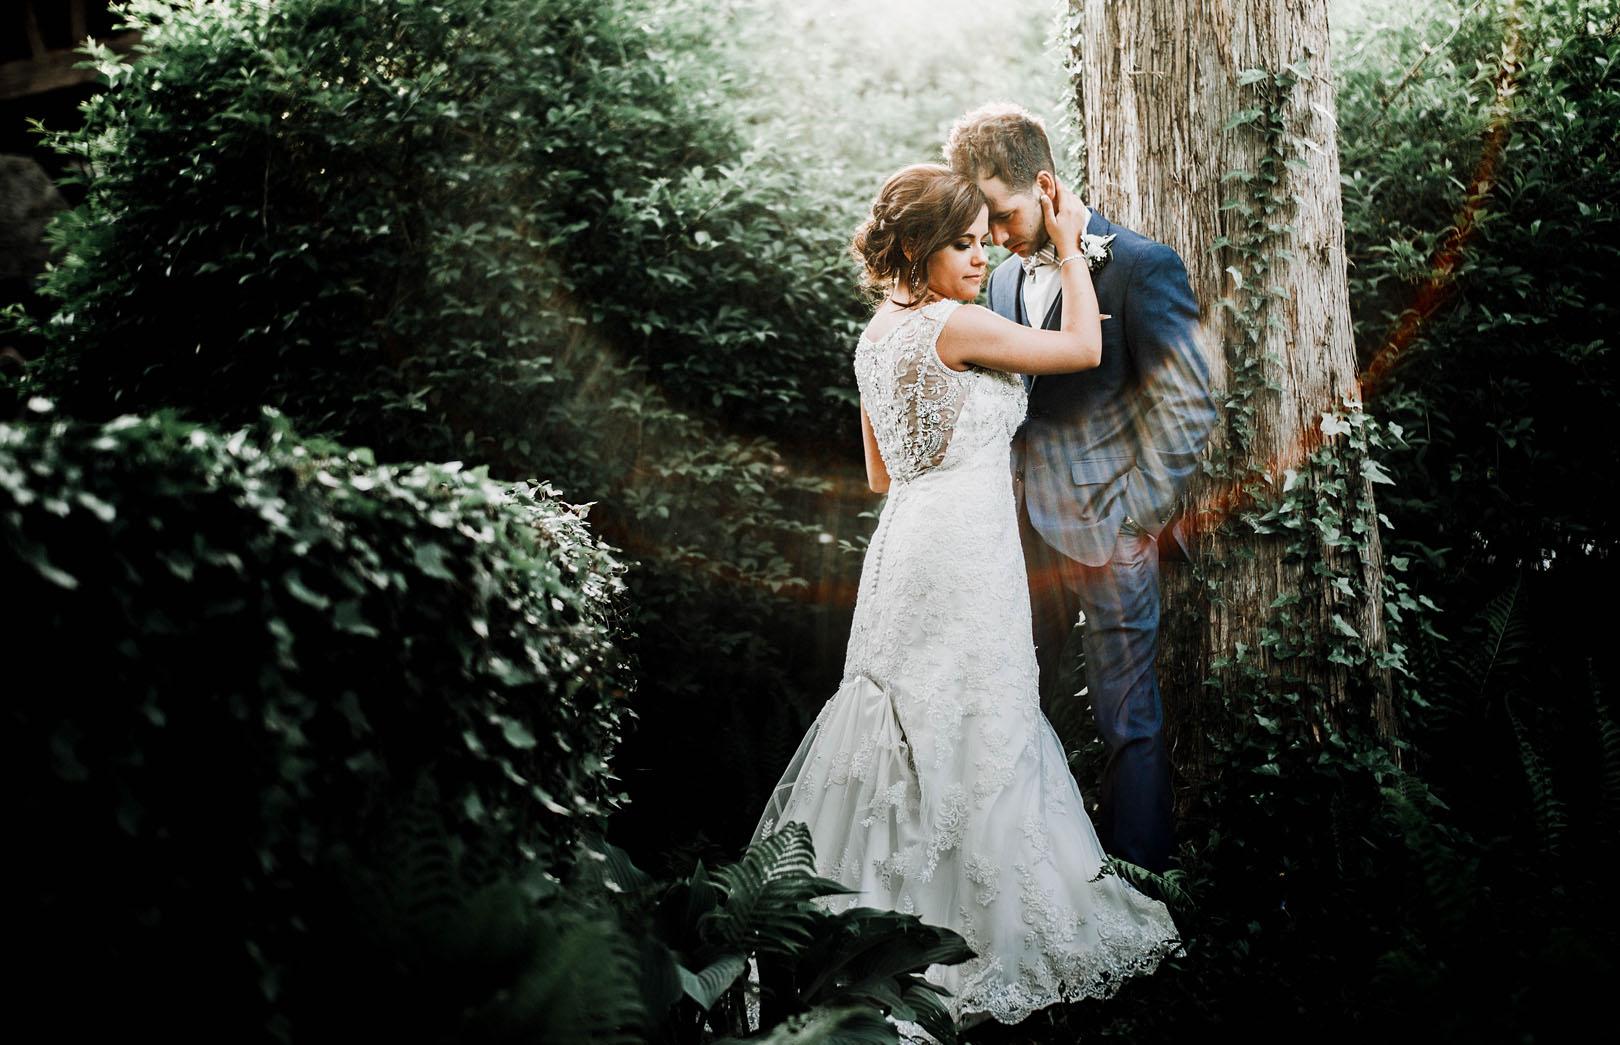 wedding-0001jpg_27057363662_o.jpg